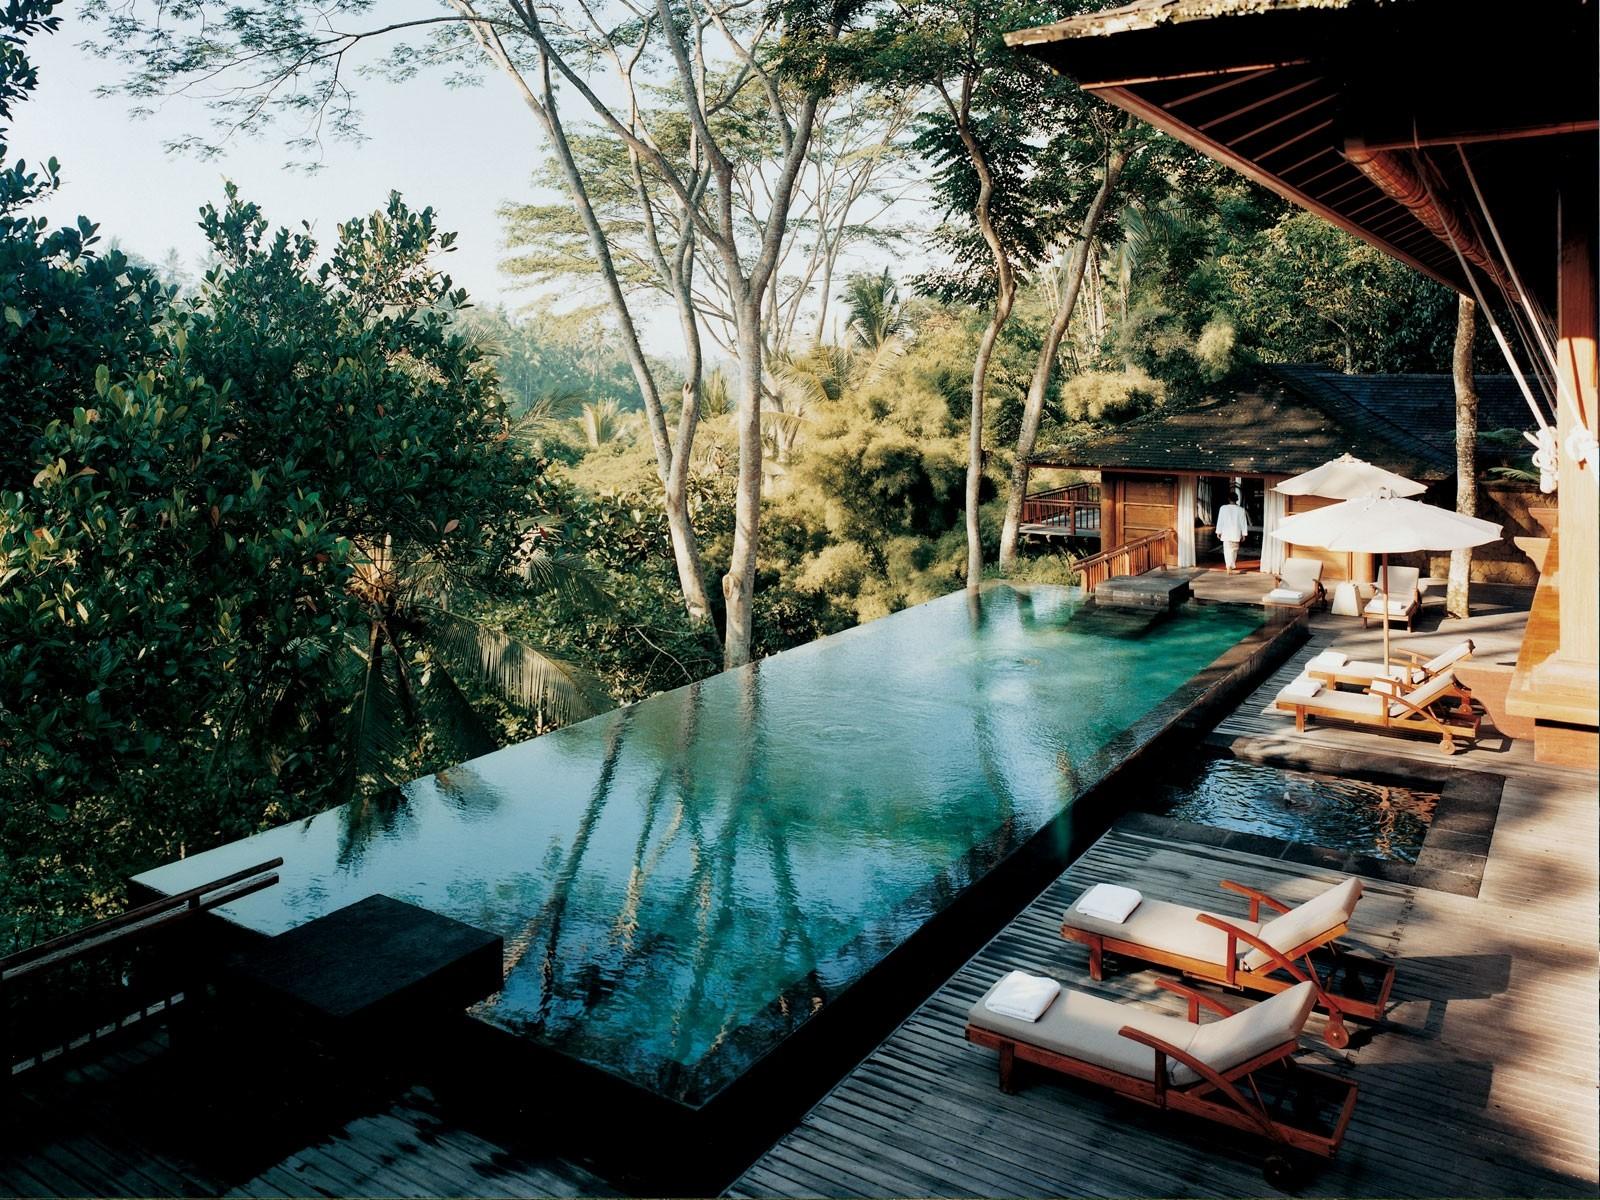 7 amazing solo travel vacation ideas - savoir flair